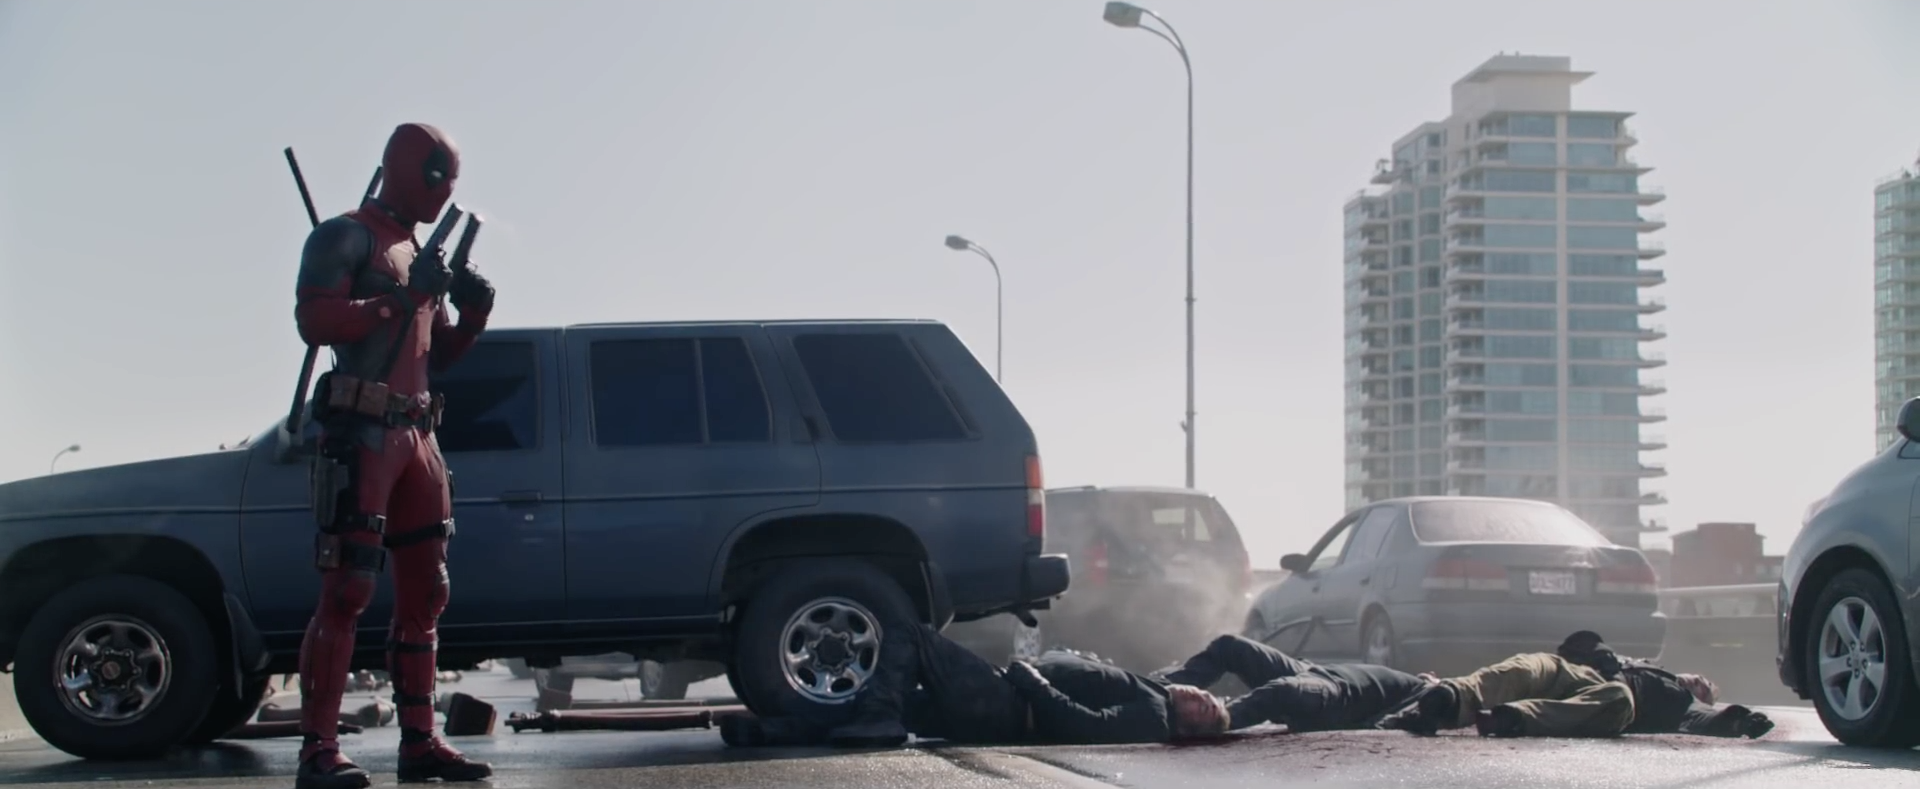 deadpool-movie-ryan-reynolds-high-res-trailer-images-screenshots-76